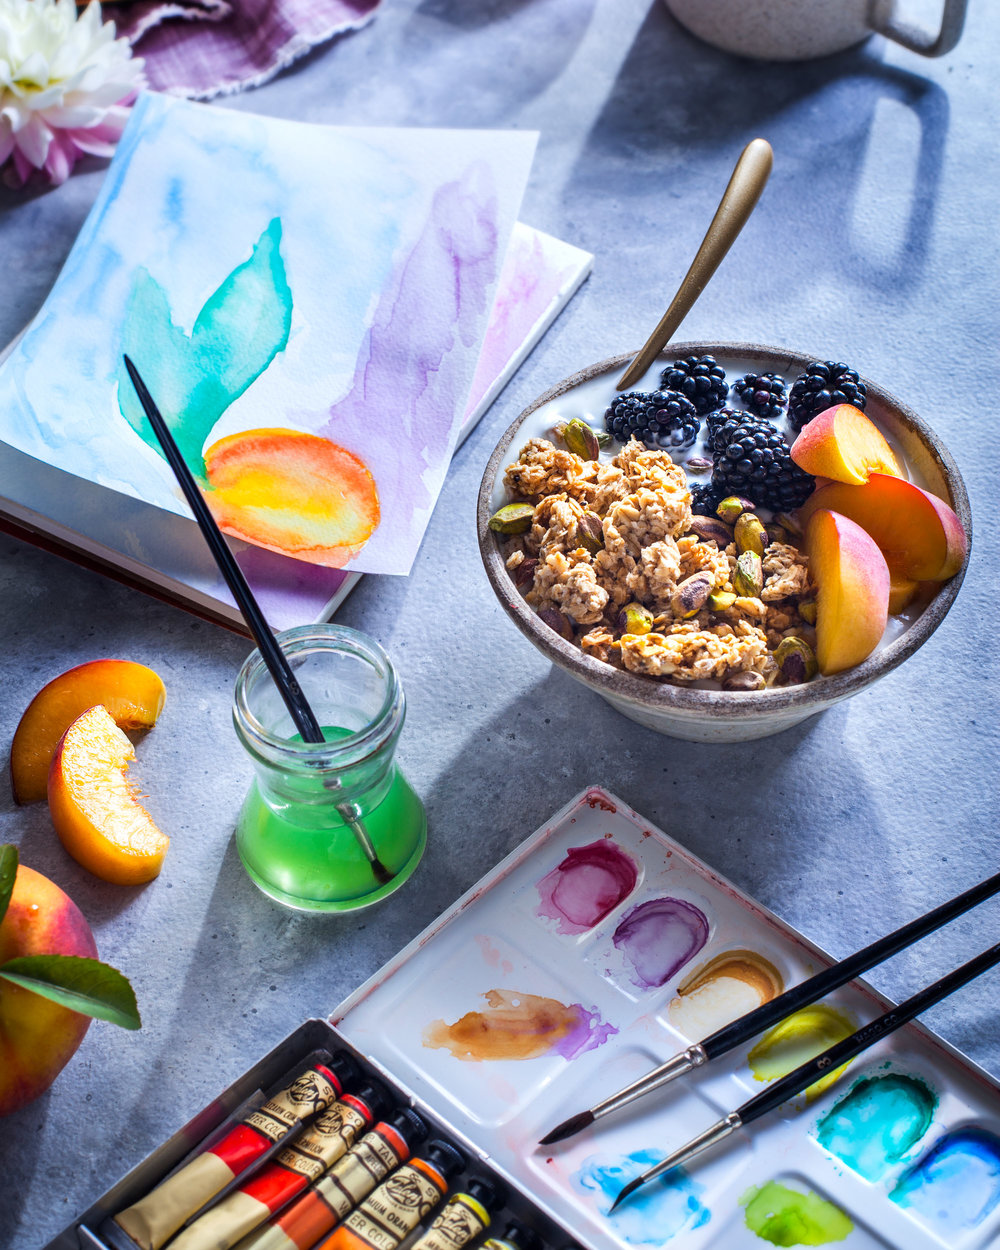 food-yogurt-granola-breakfast-lesliegrow.jpg